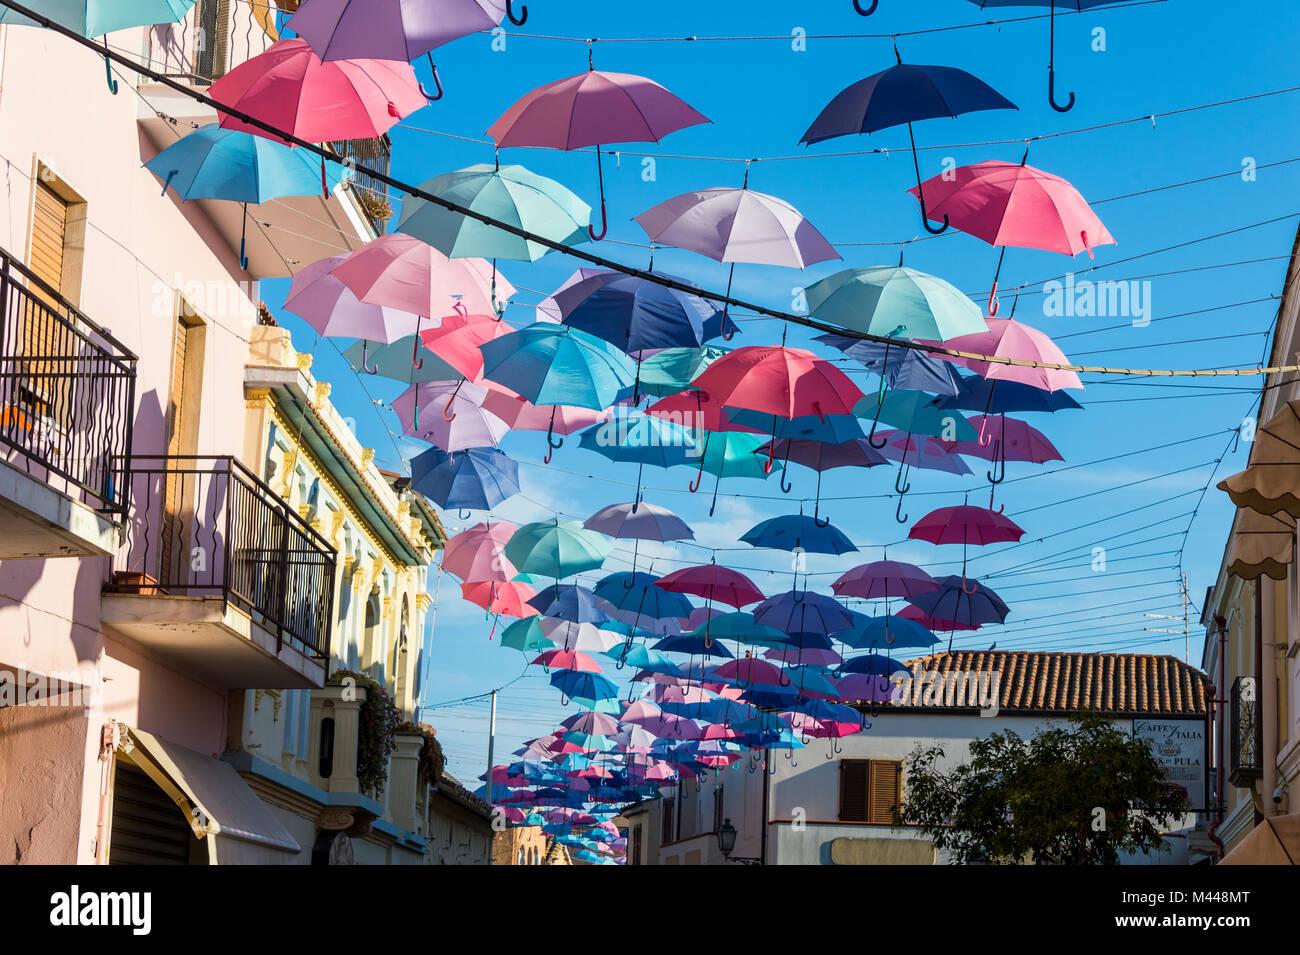 Sonnenschirme Straße in Pula, Sardinien, Italien Stockbild